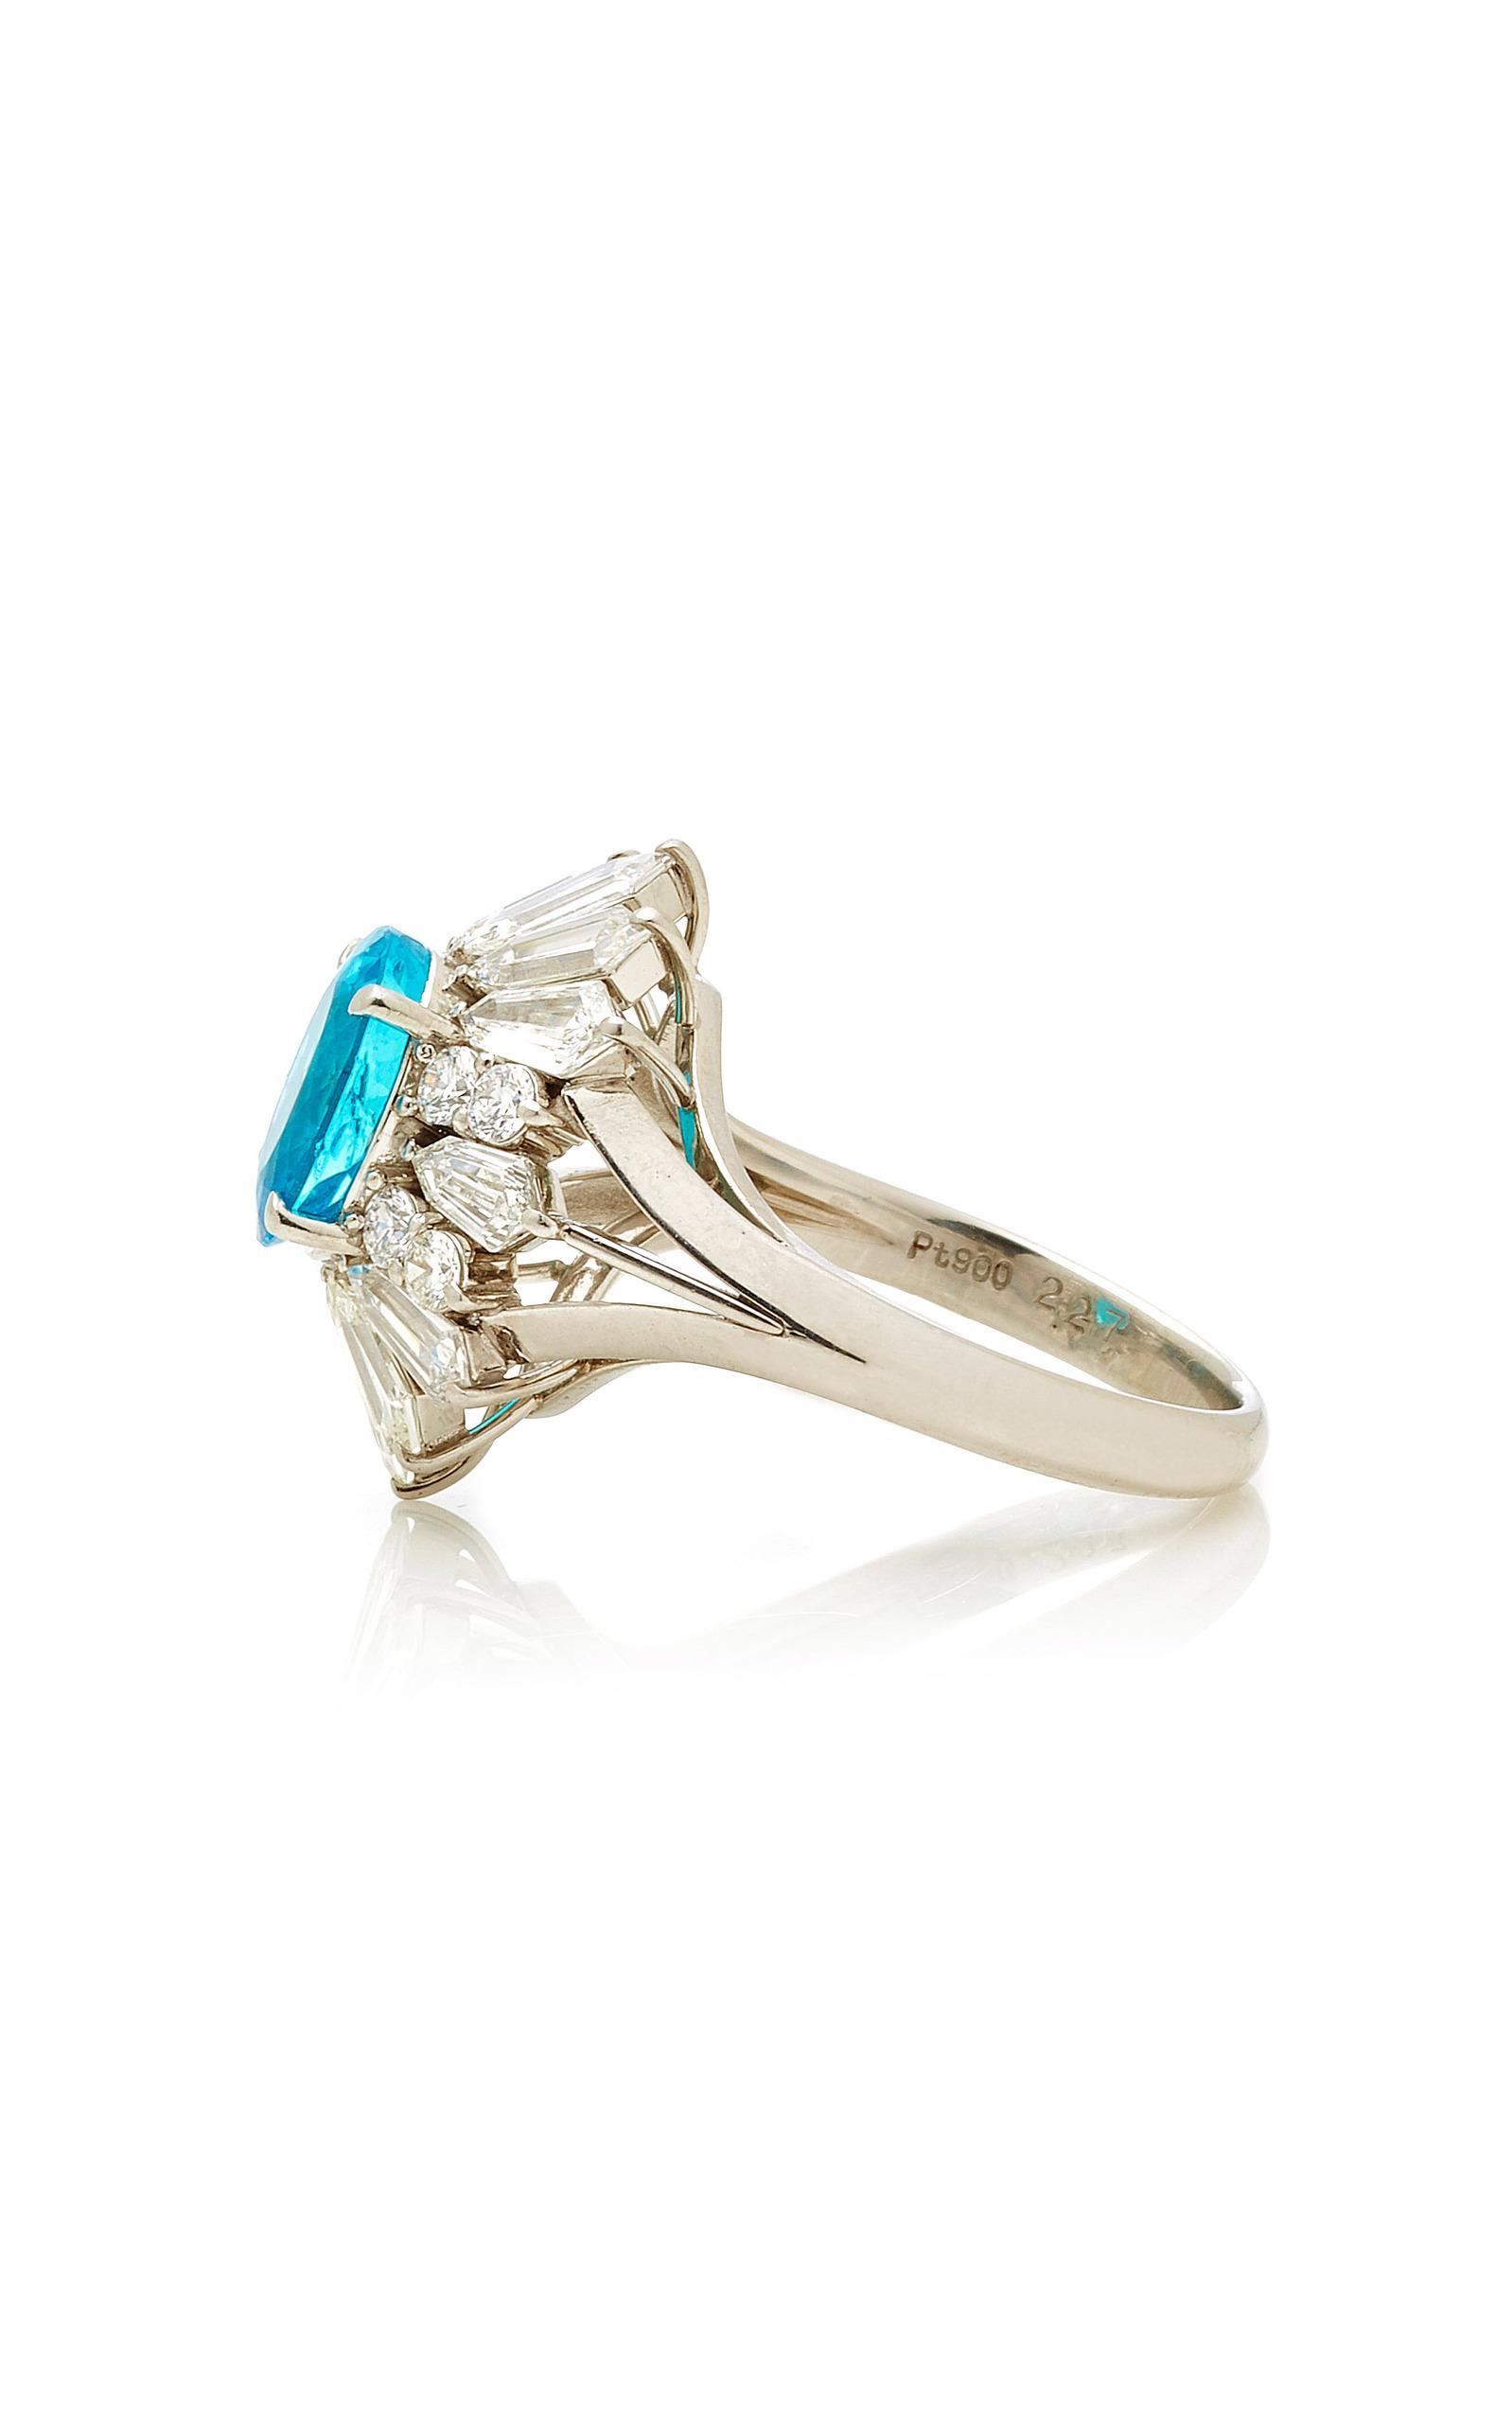 Martin Katz Paraiba Tourmaline Ring in Blue